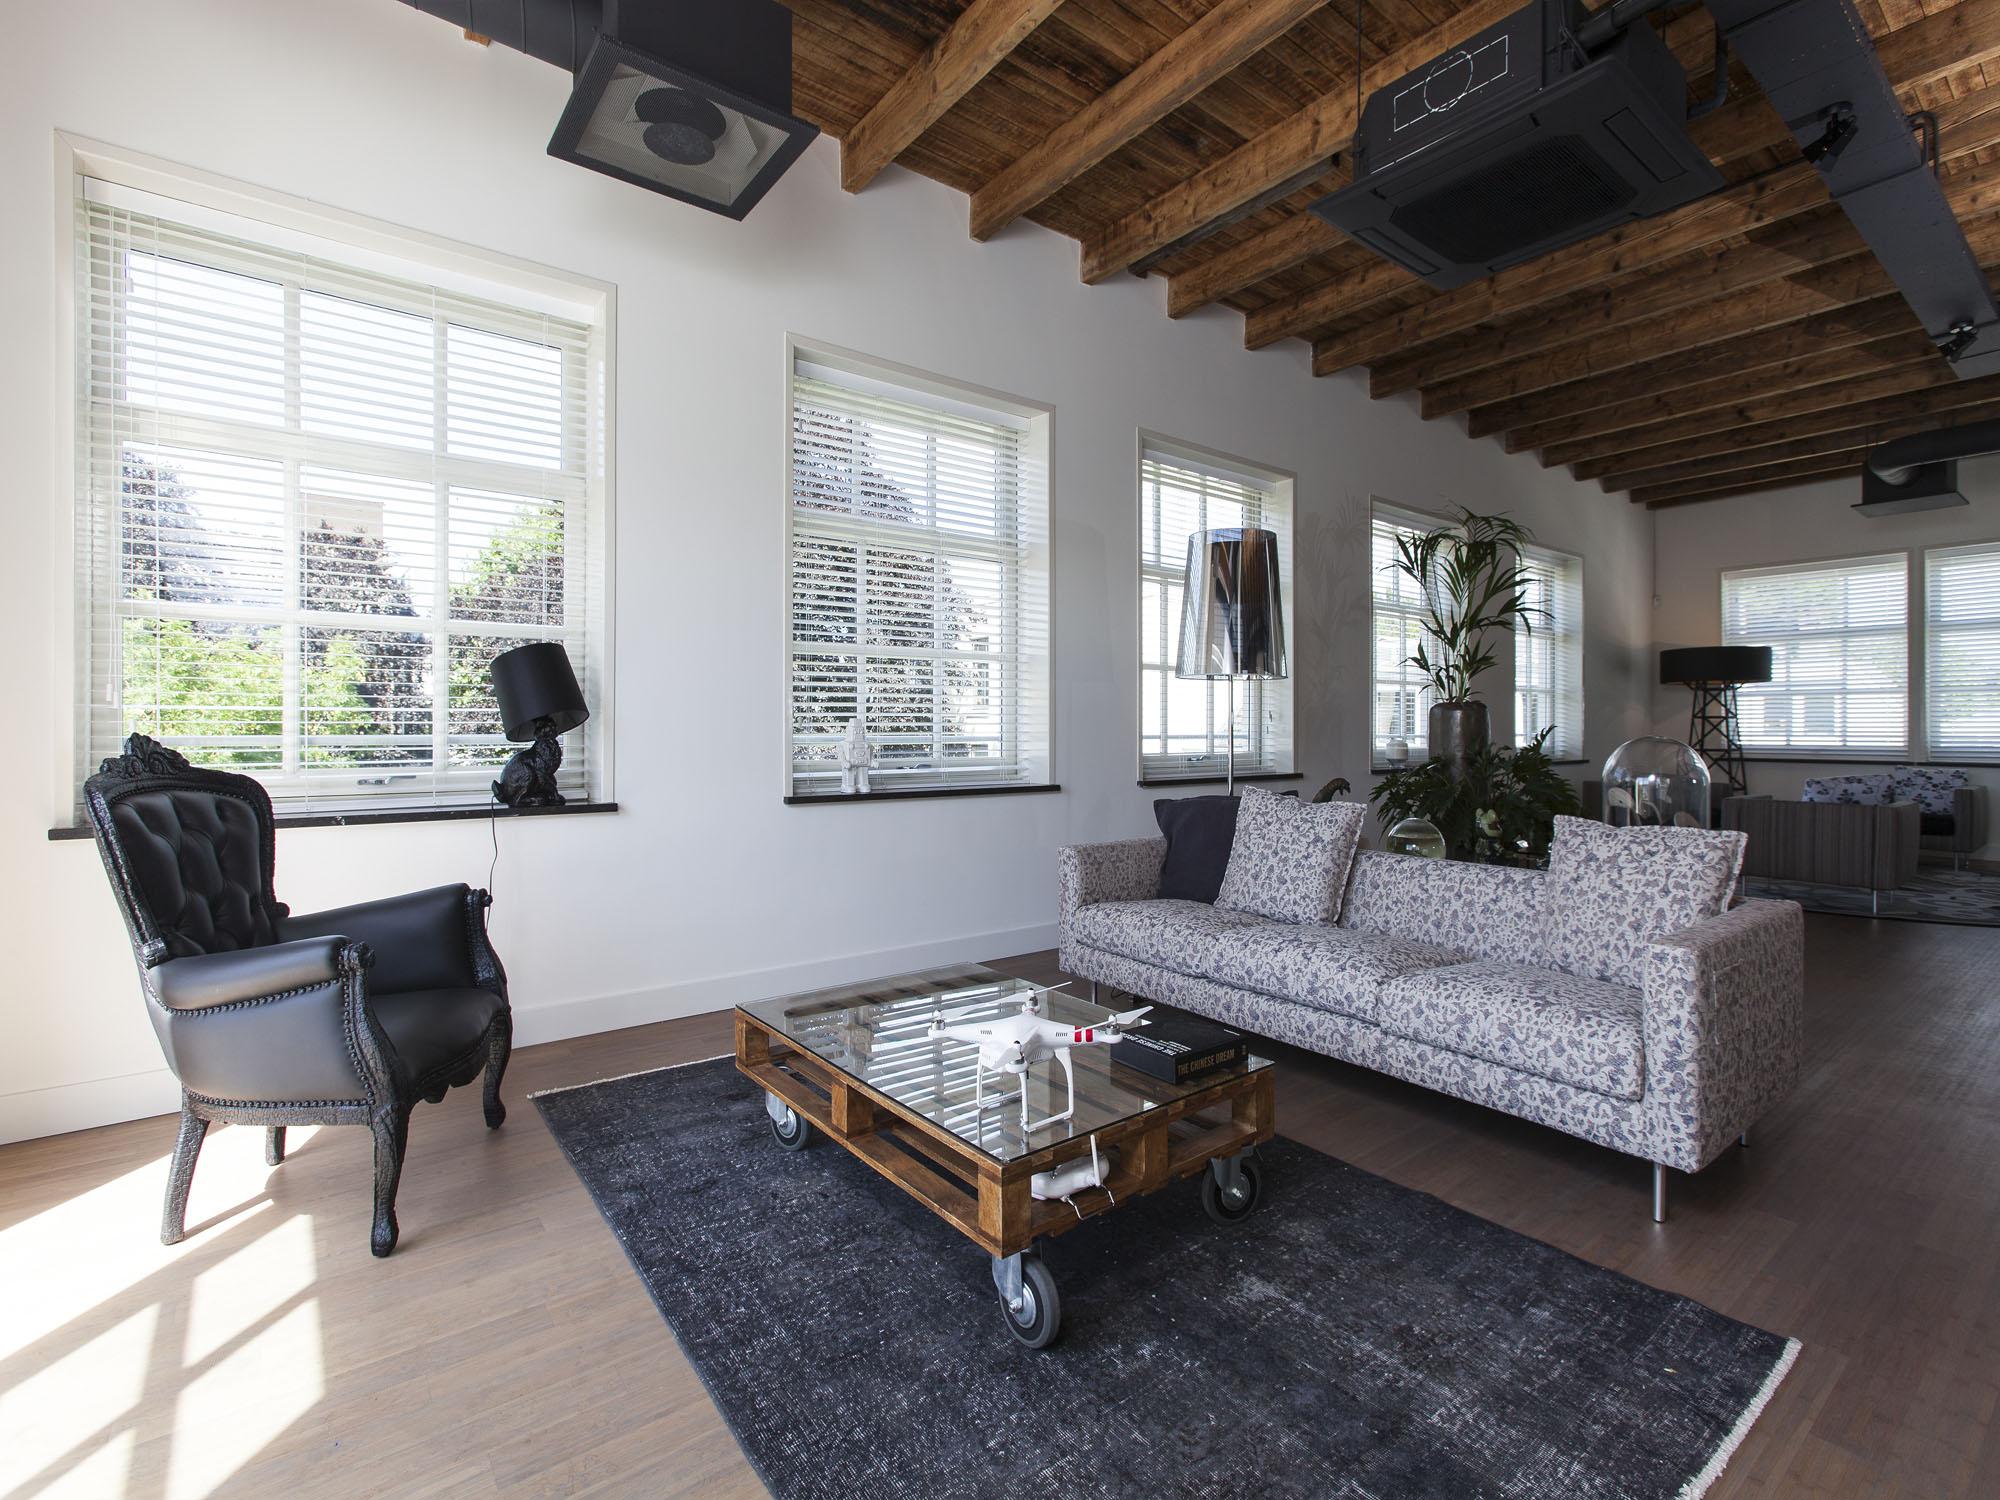 studio-hermanides-loft-office-3.jpg